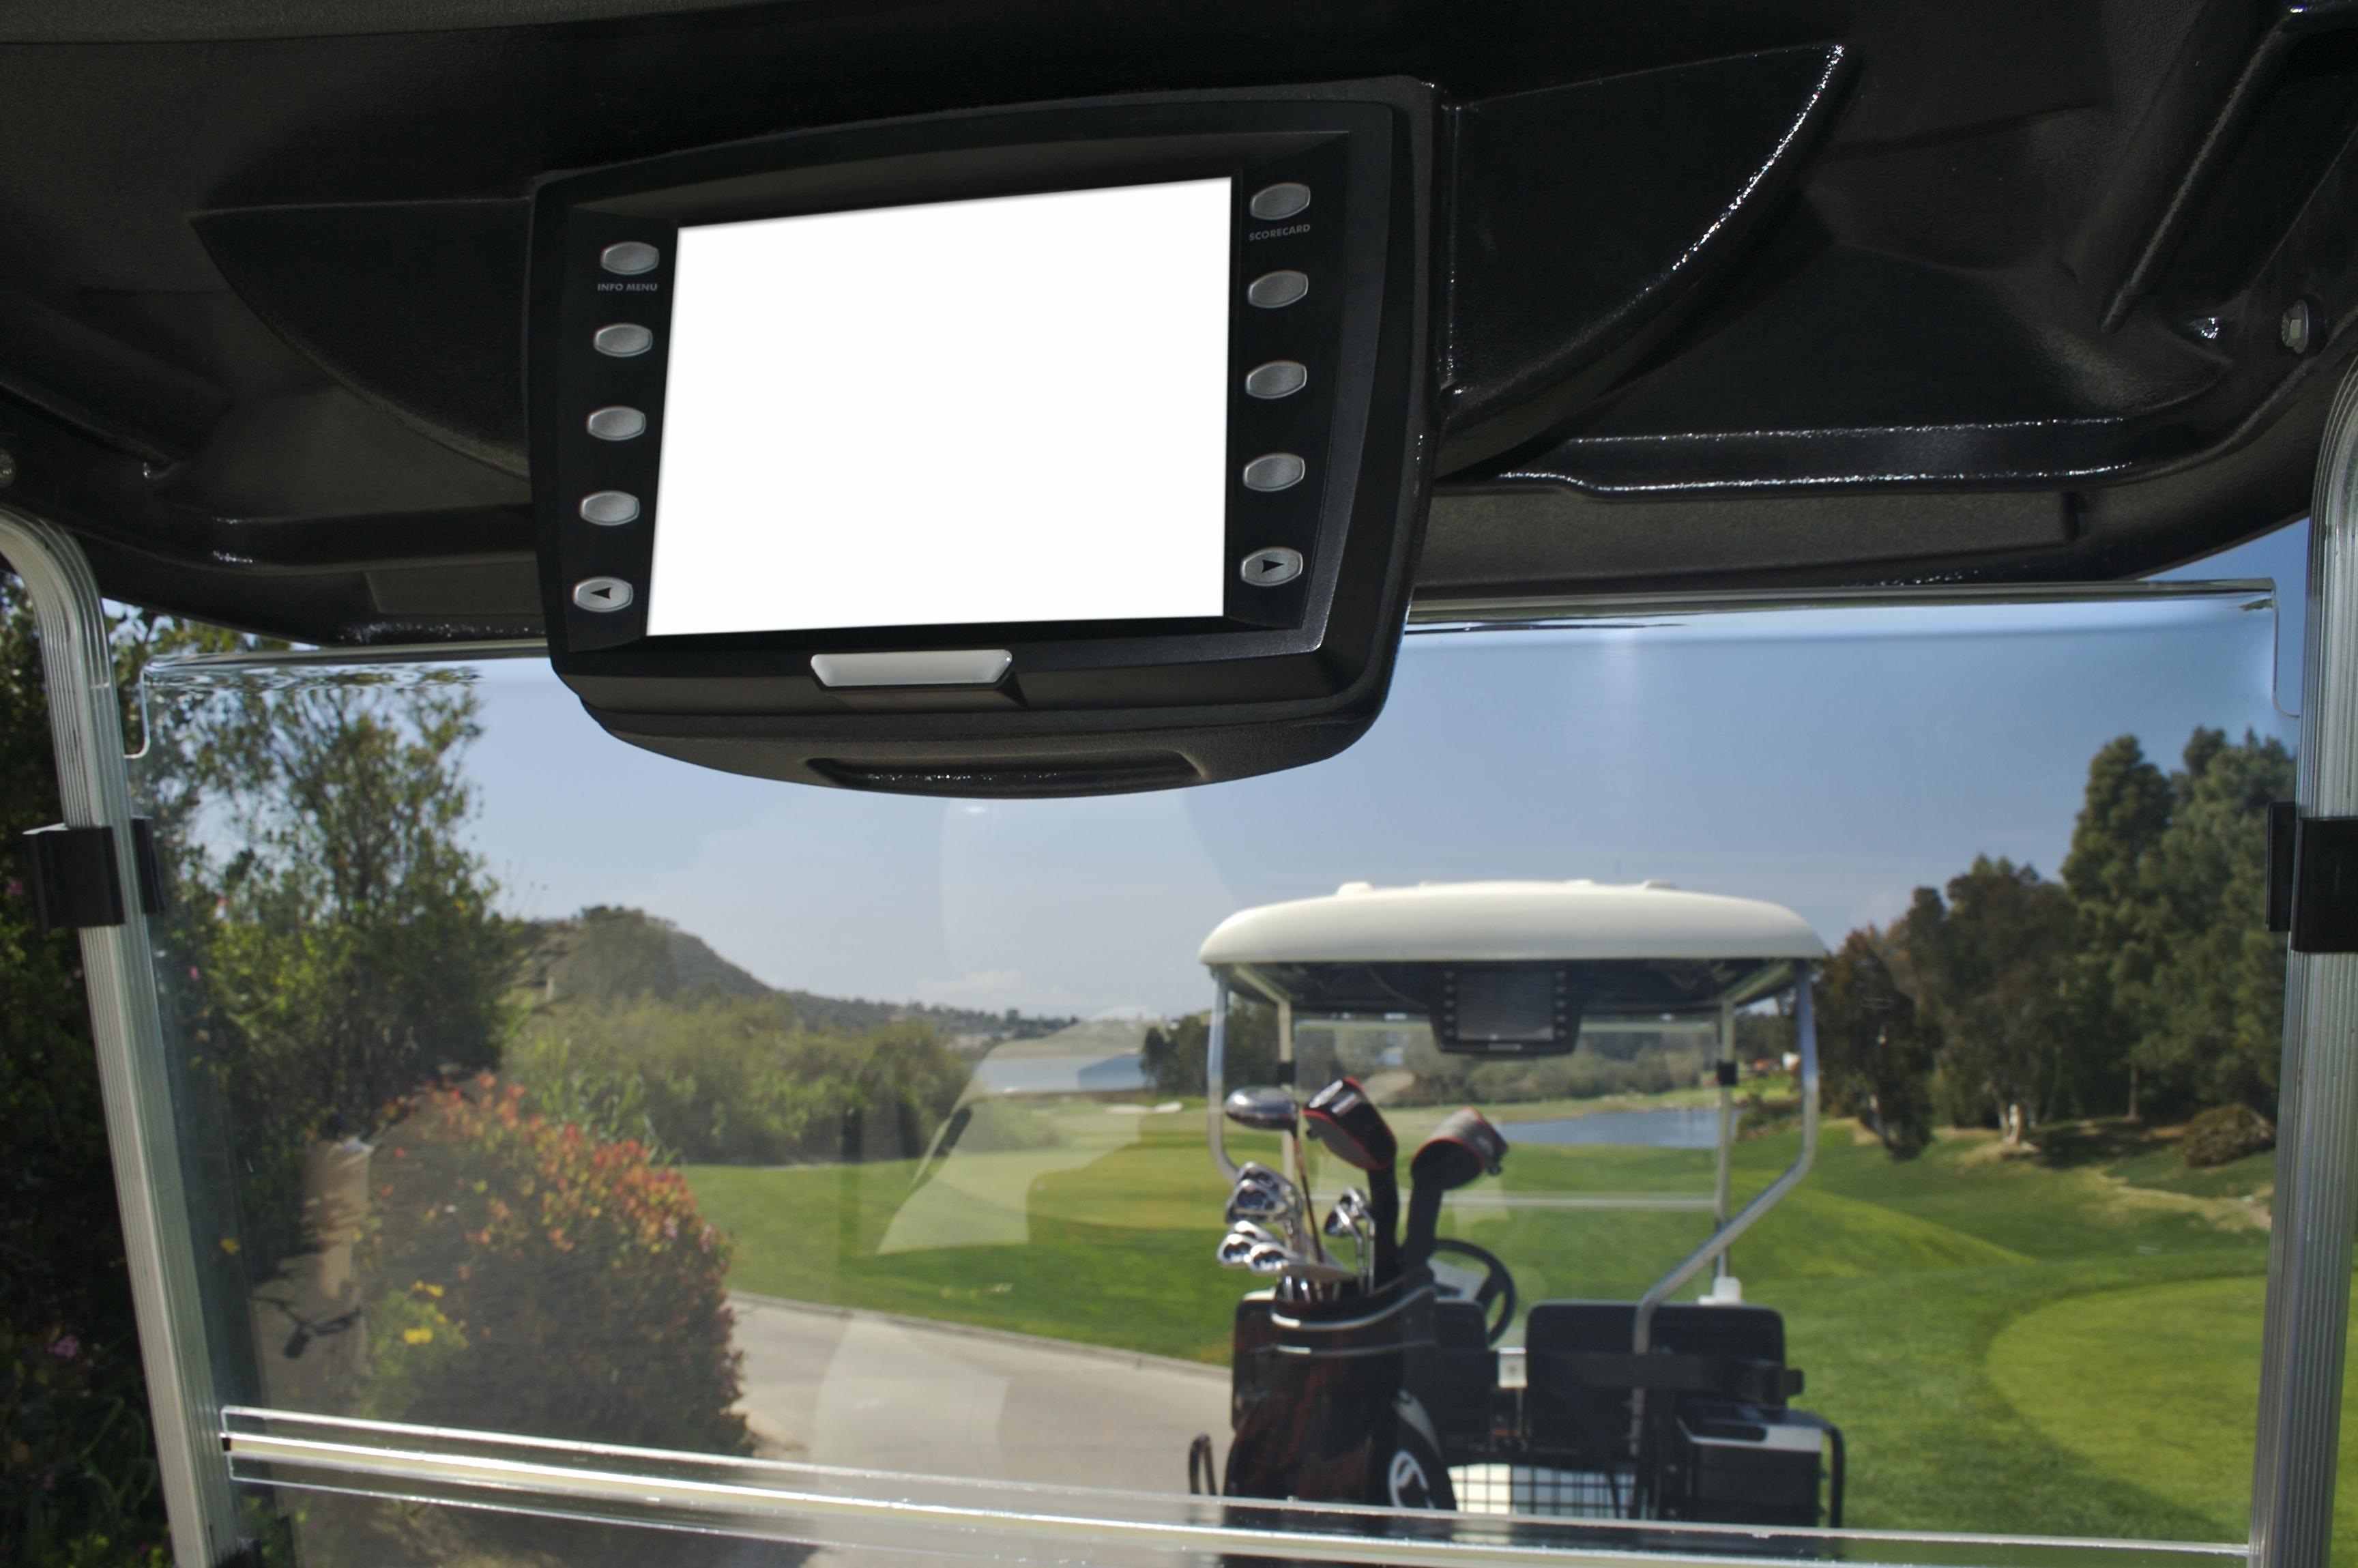 How Does a Golf Rangefinder Work? | Golfweek Golf Cart With Screen Html on golf cart ceramics, golf cart lights, golf cart tv, golf cart ac units, golf cart security, golf cart frames, golf cart storage, golf cart painting, golf cart shelves, golf cart netting, golf cart cones, golf cart benches, golf cart windows, golf cart blinds, golf cart tree, golf cart awnings, golf cart audio, golf cart locks, golf cart lamps, golf cart cables,